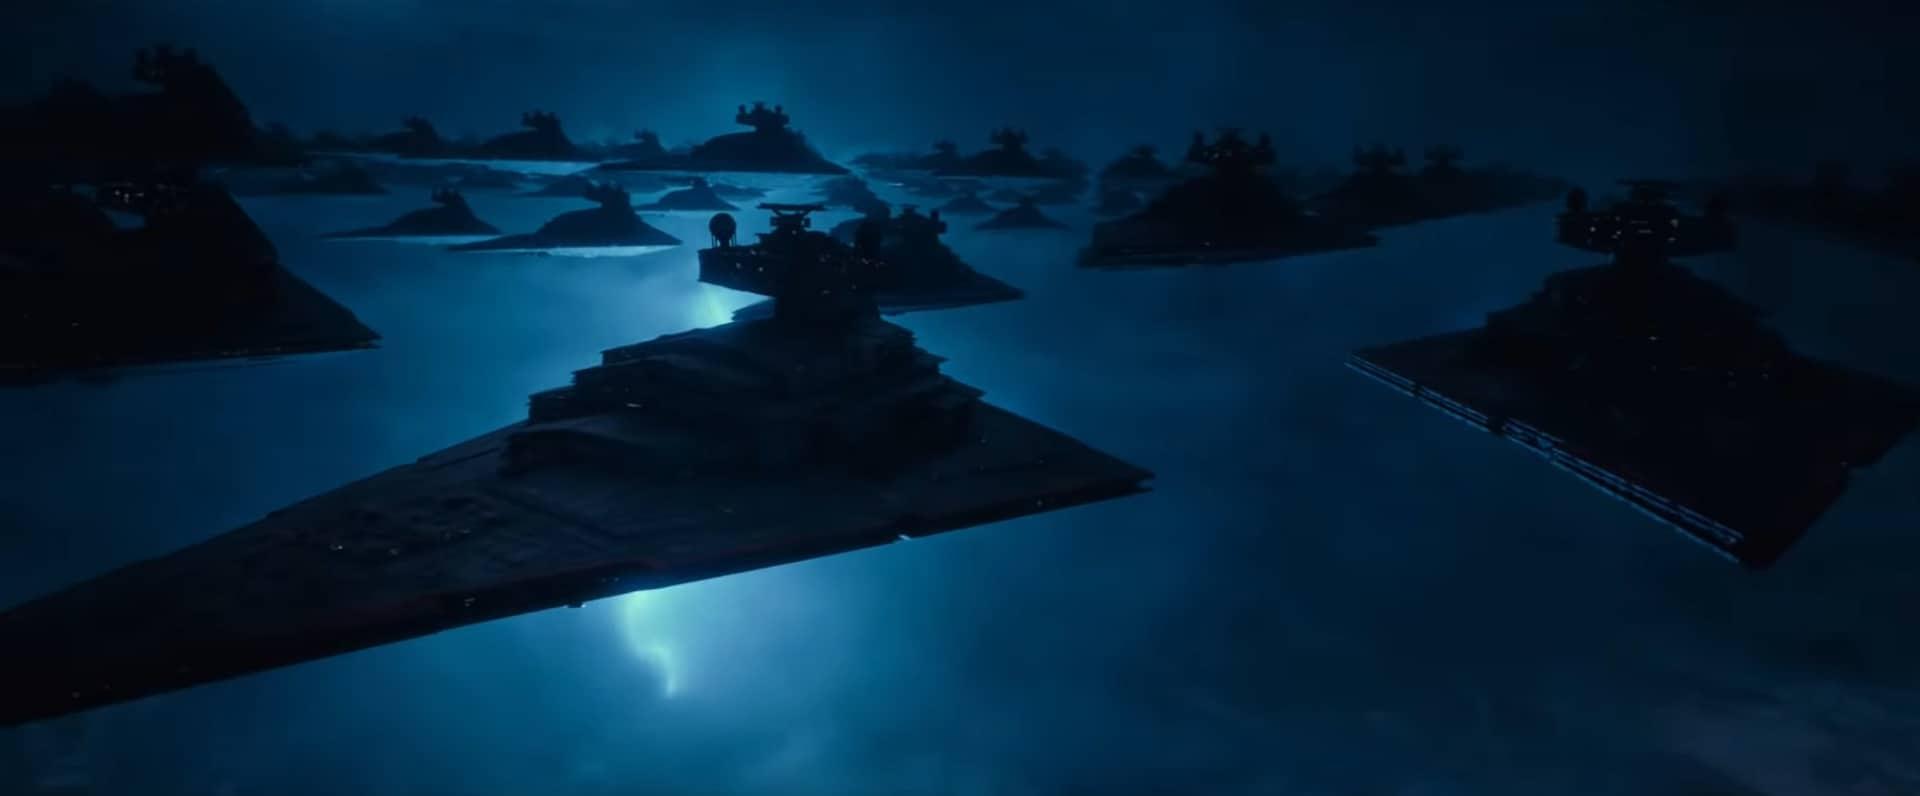 Star Wars L'ascesa di Skywalker recensione